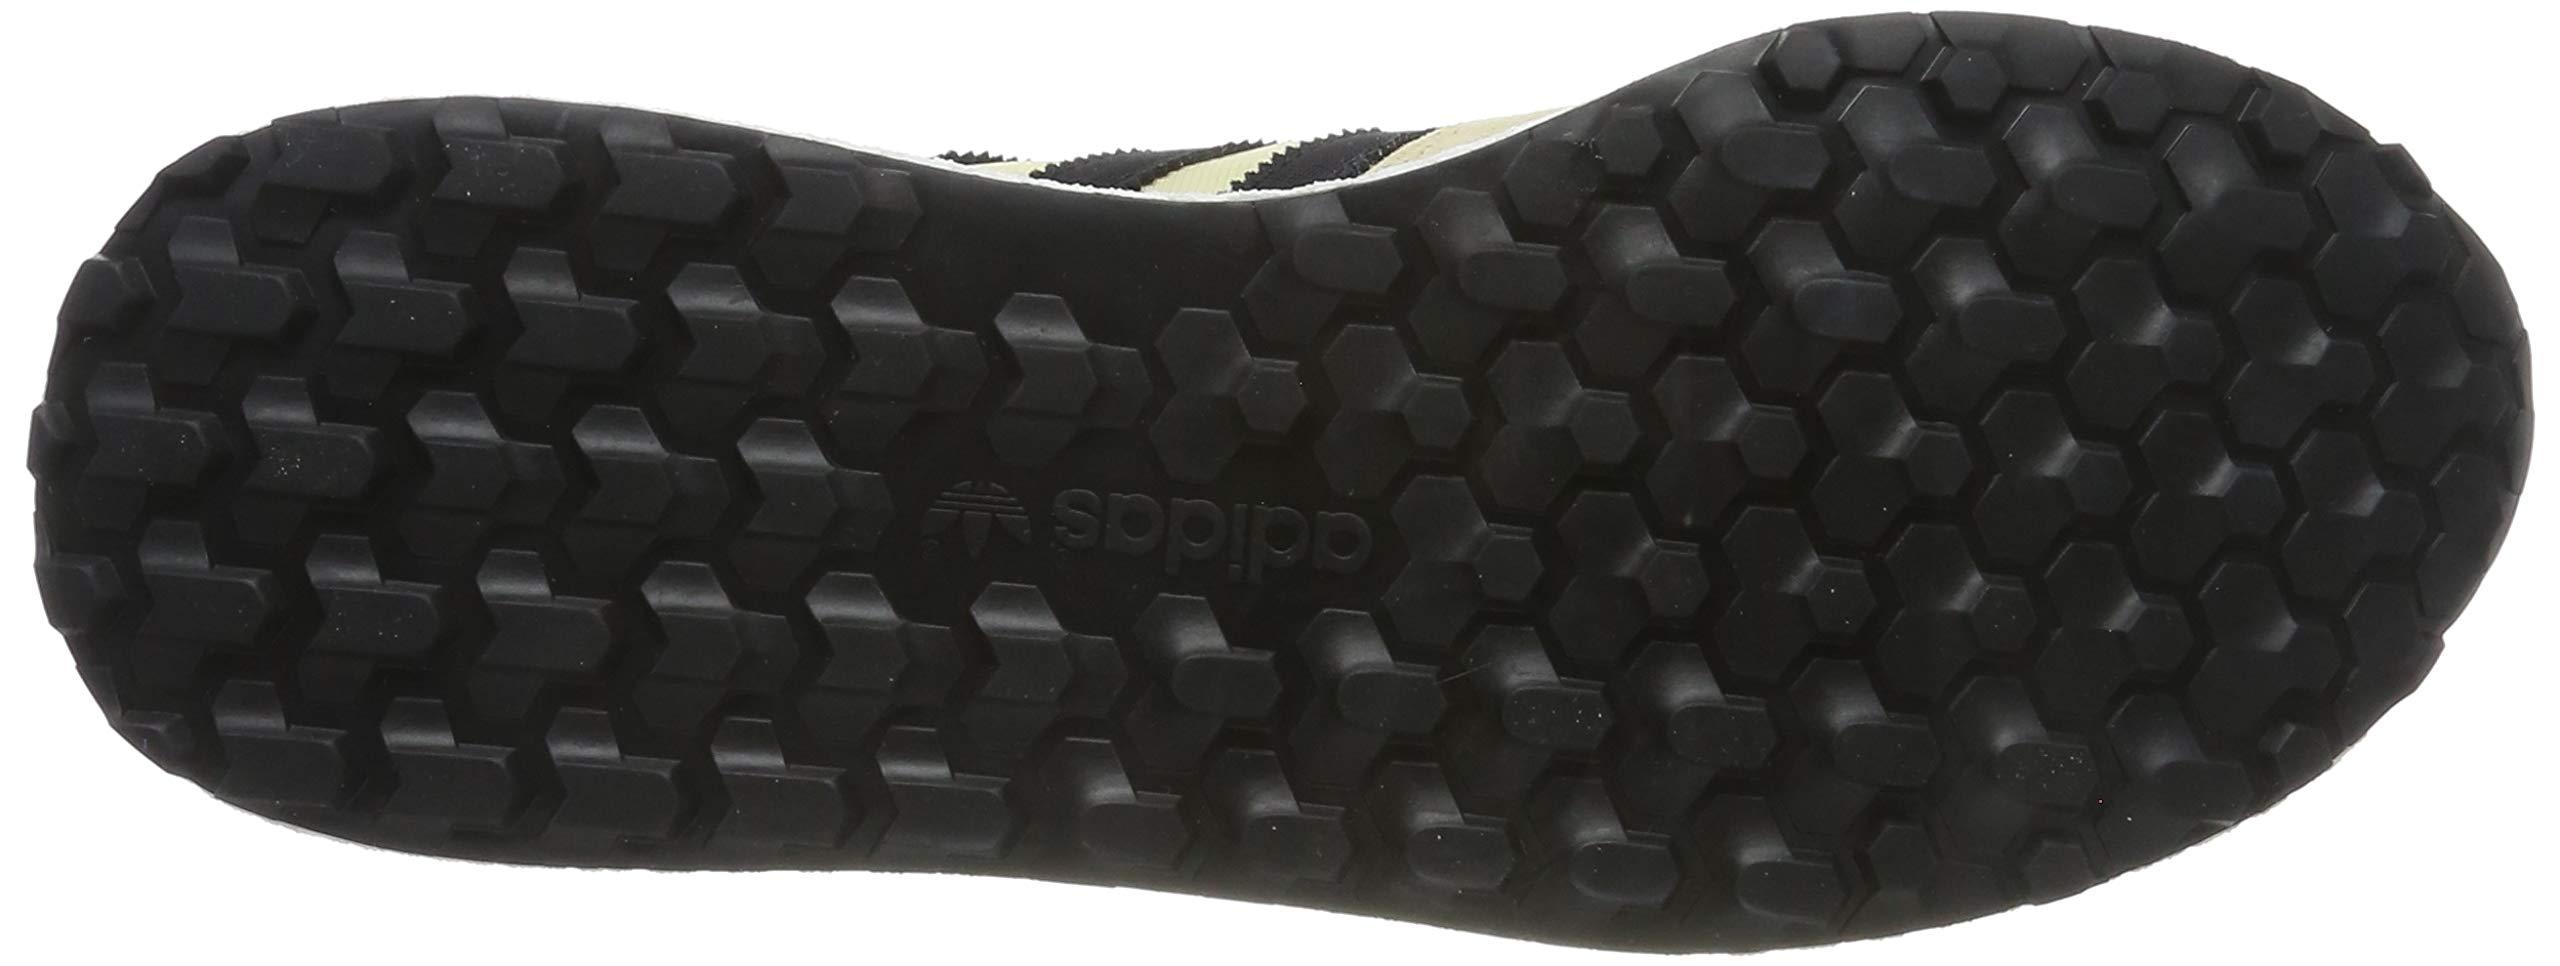 adidas Forest Grove, Scarpe da Ginnastica Basse Uomo 9 spesavip